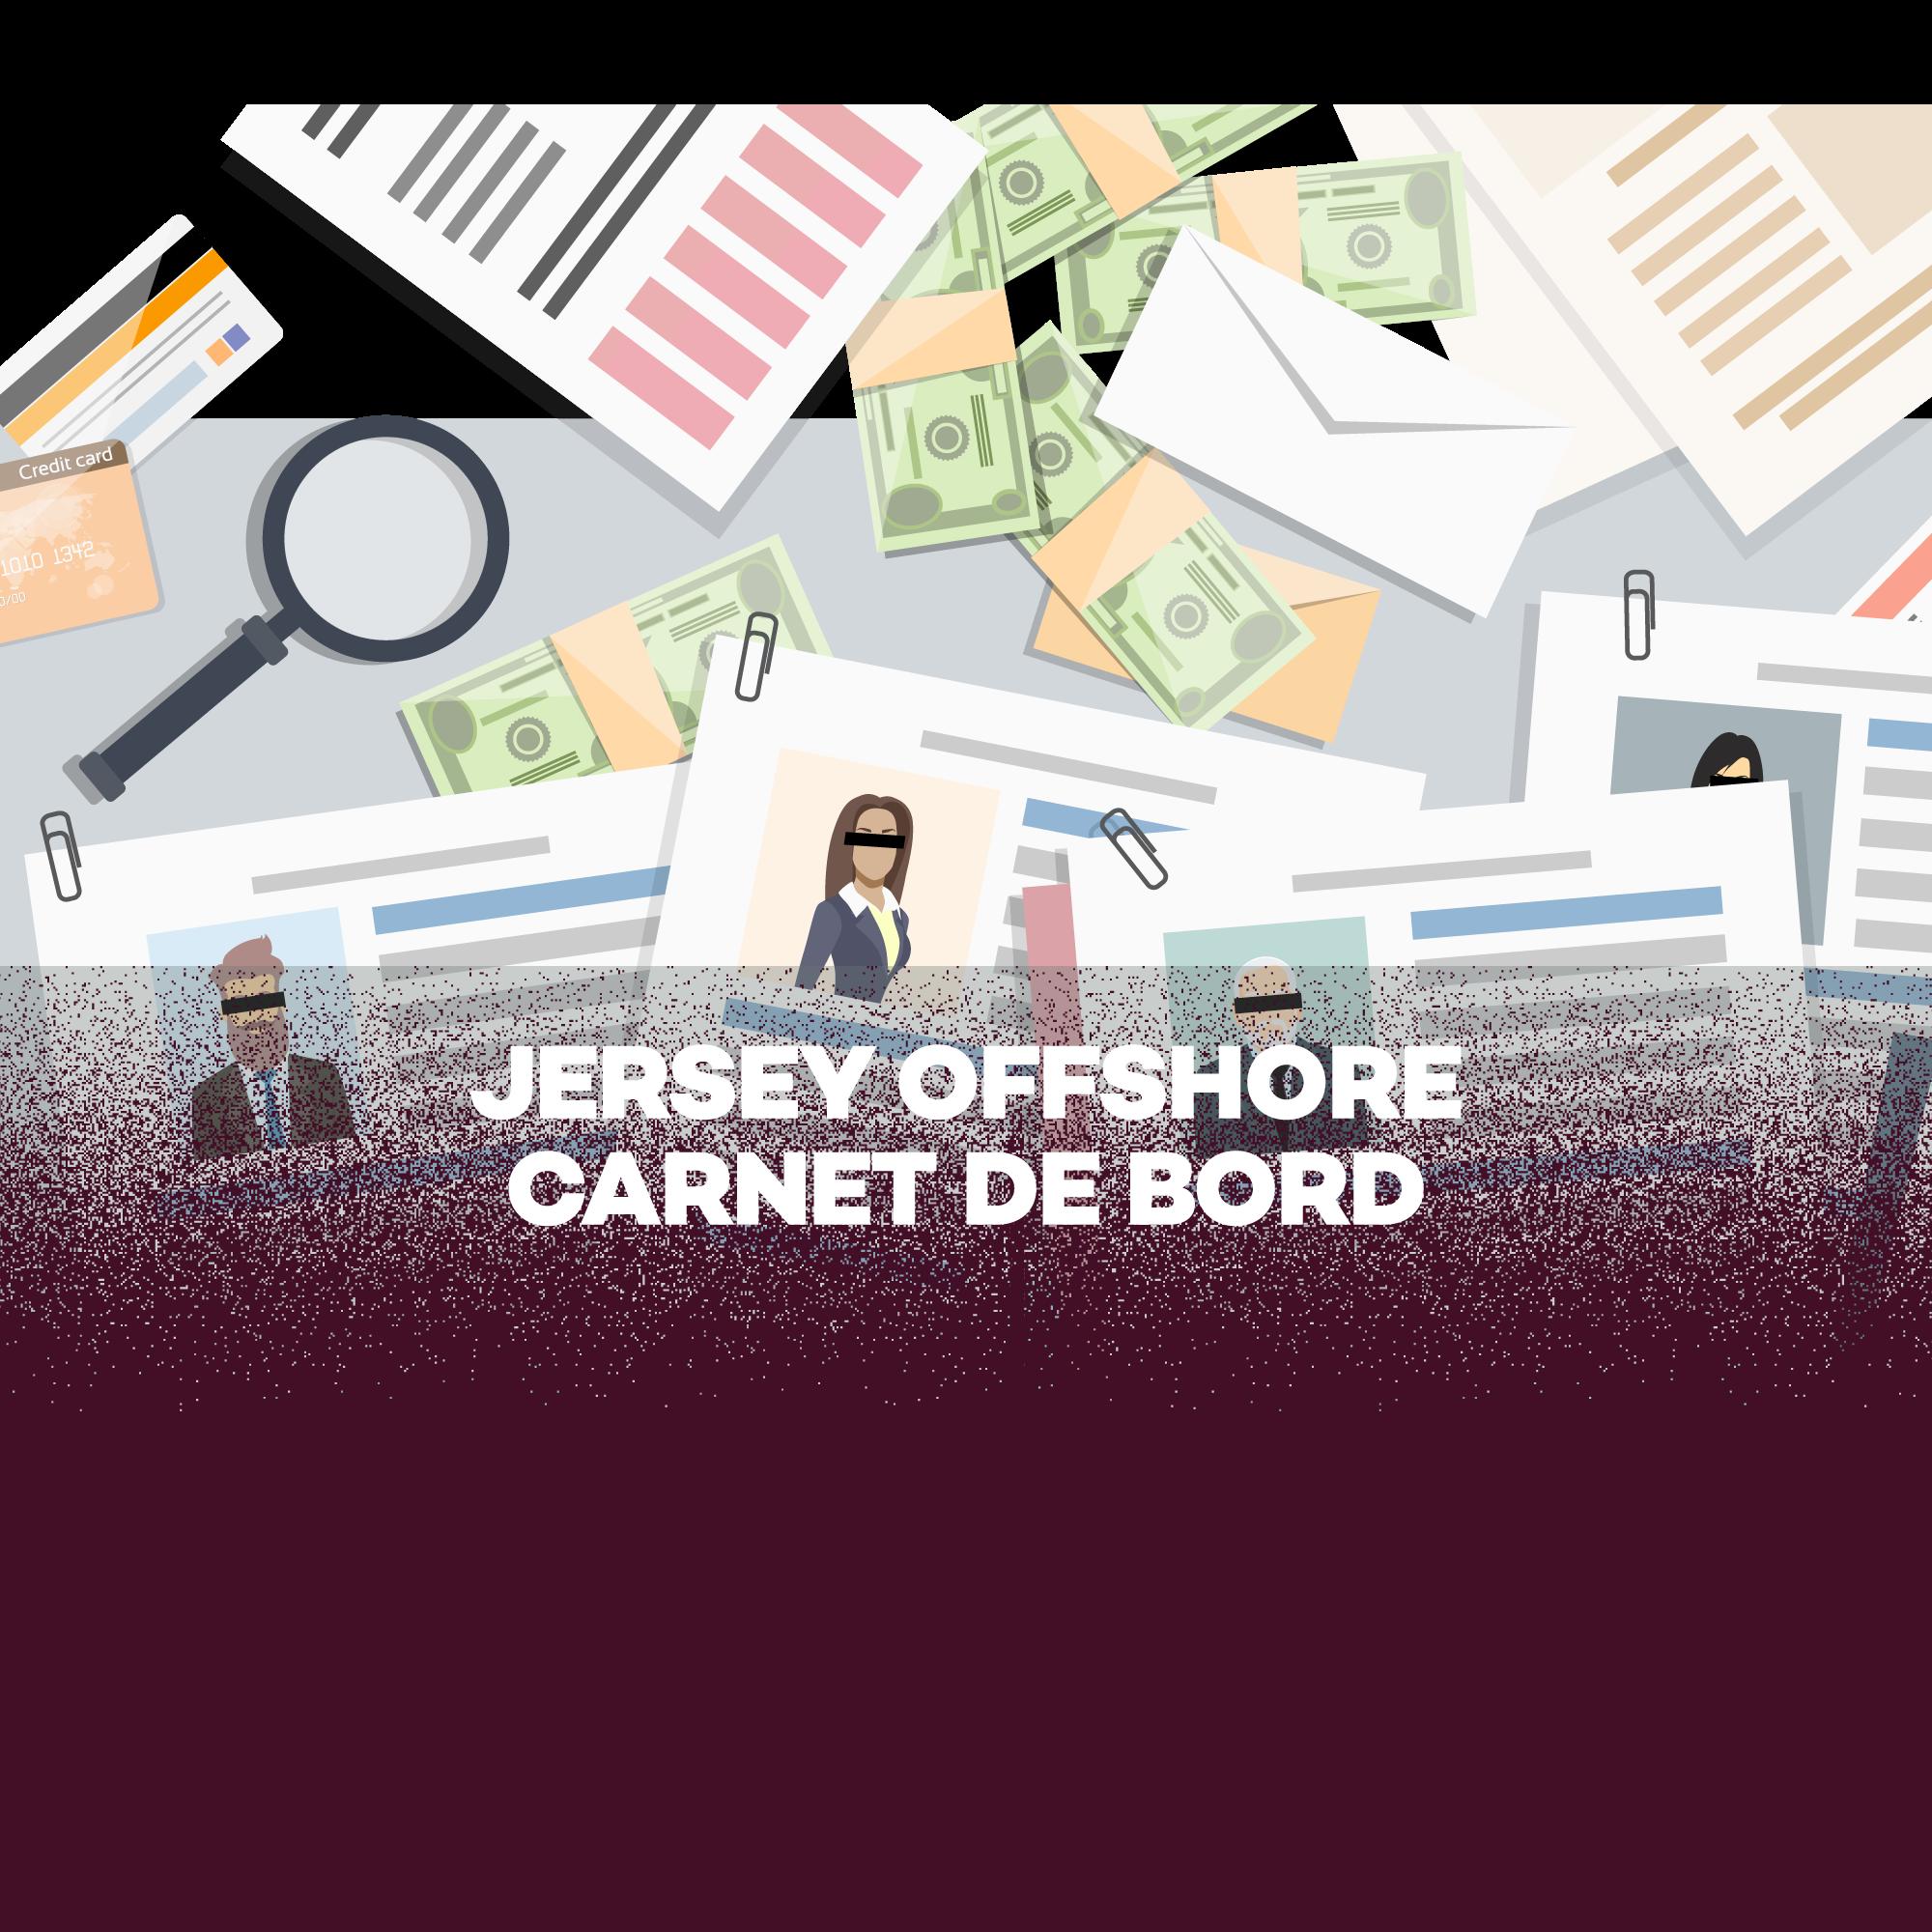 Logo Jersey offshore : carnet de bord [RTS]